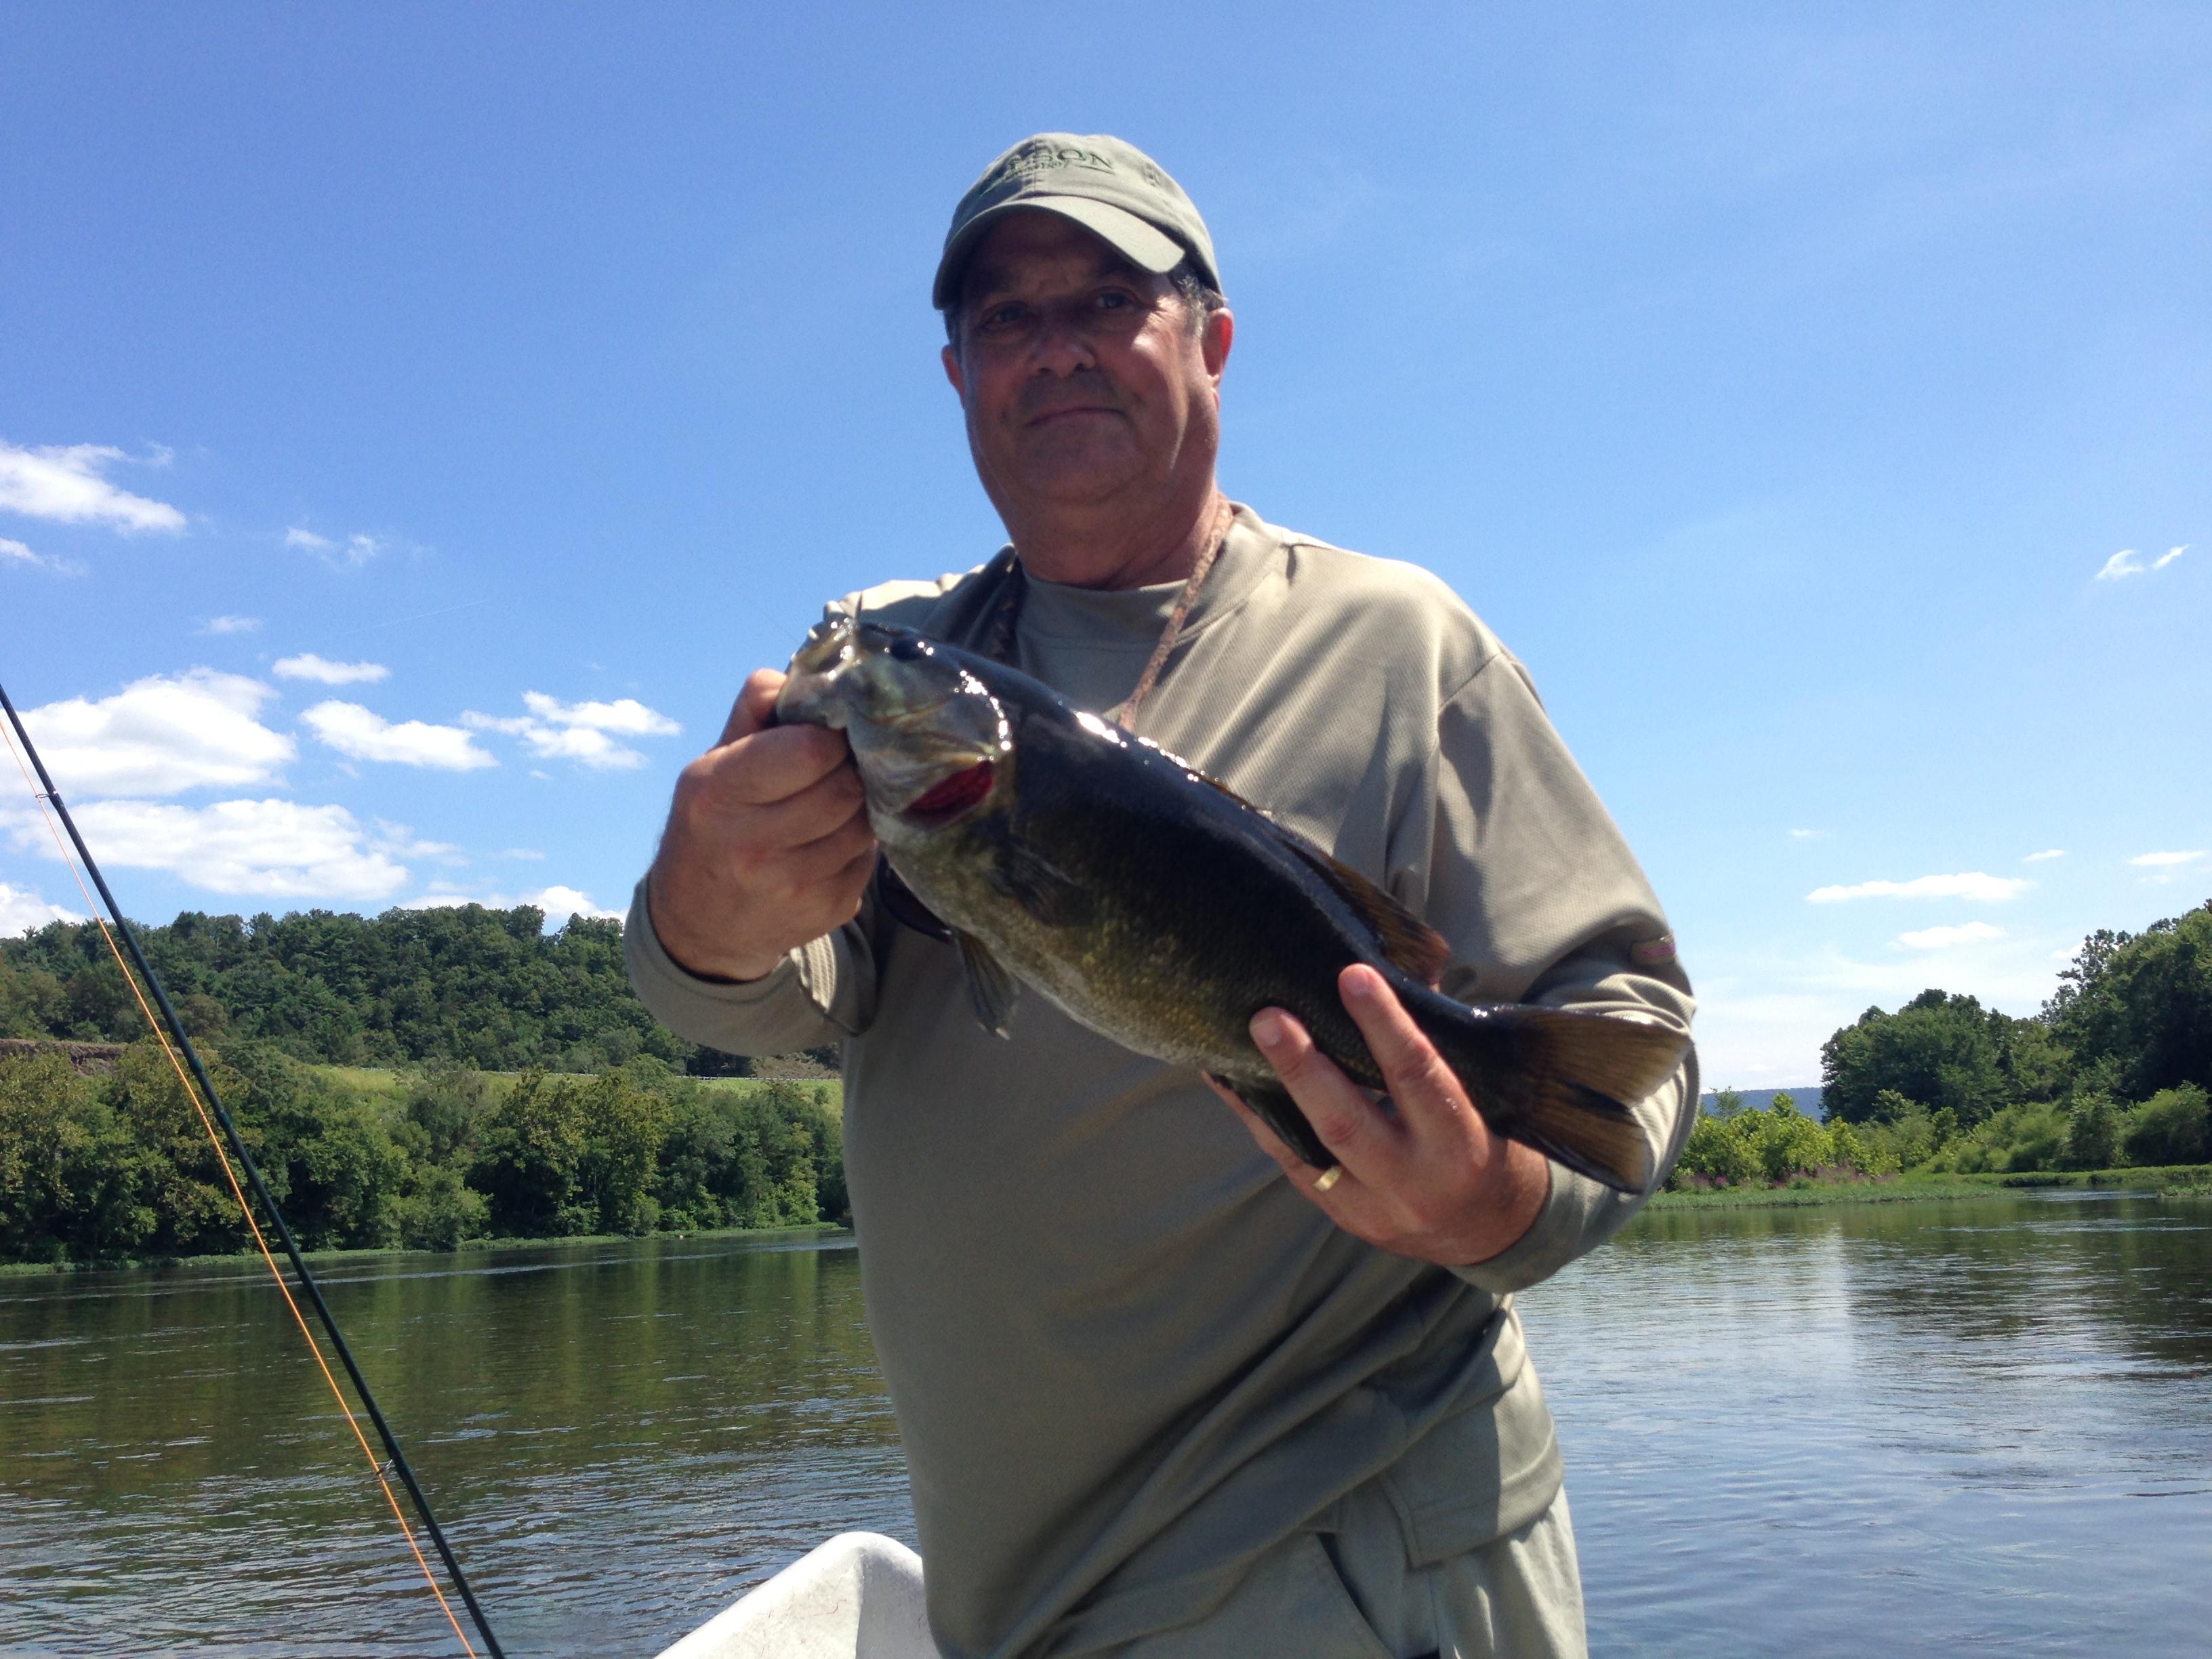 Susquehanna river fly fishing photos susquehanna river for Susquehanna river fishing